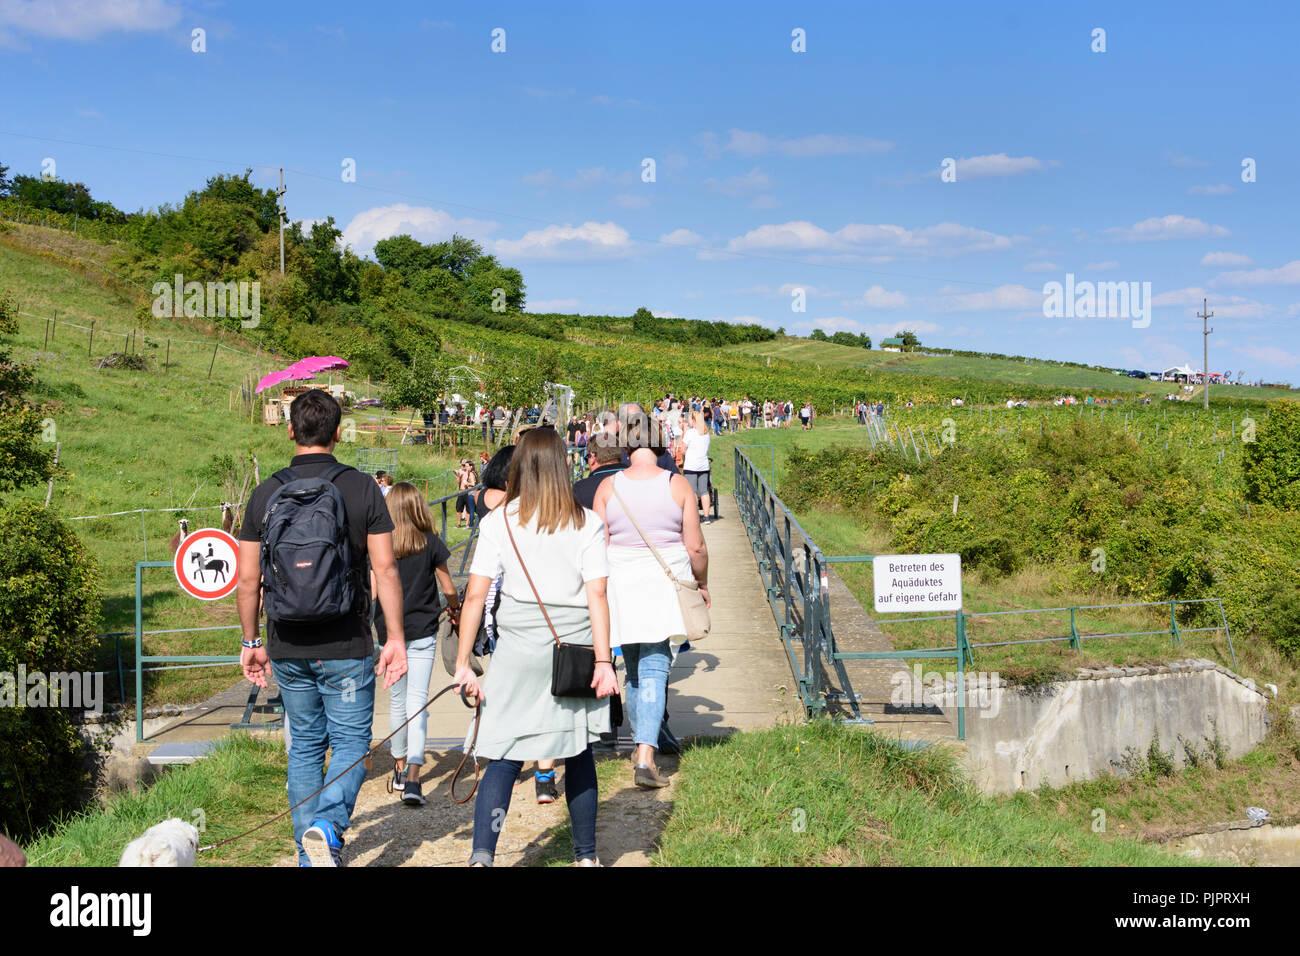 "Pfaffstätten: aqueduct of 1st Vienna water line, vineyard, bar at festival ""Genussmeile"" along 1st Vienna water line hiking path, winegrowing enterpri Stock Photo"